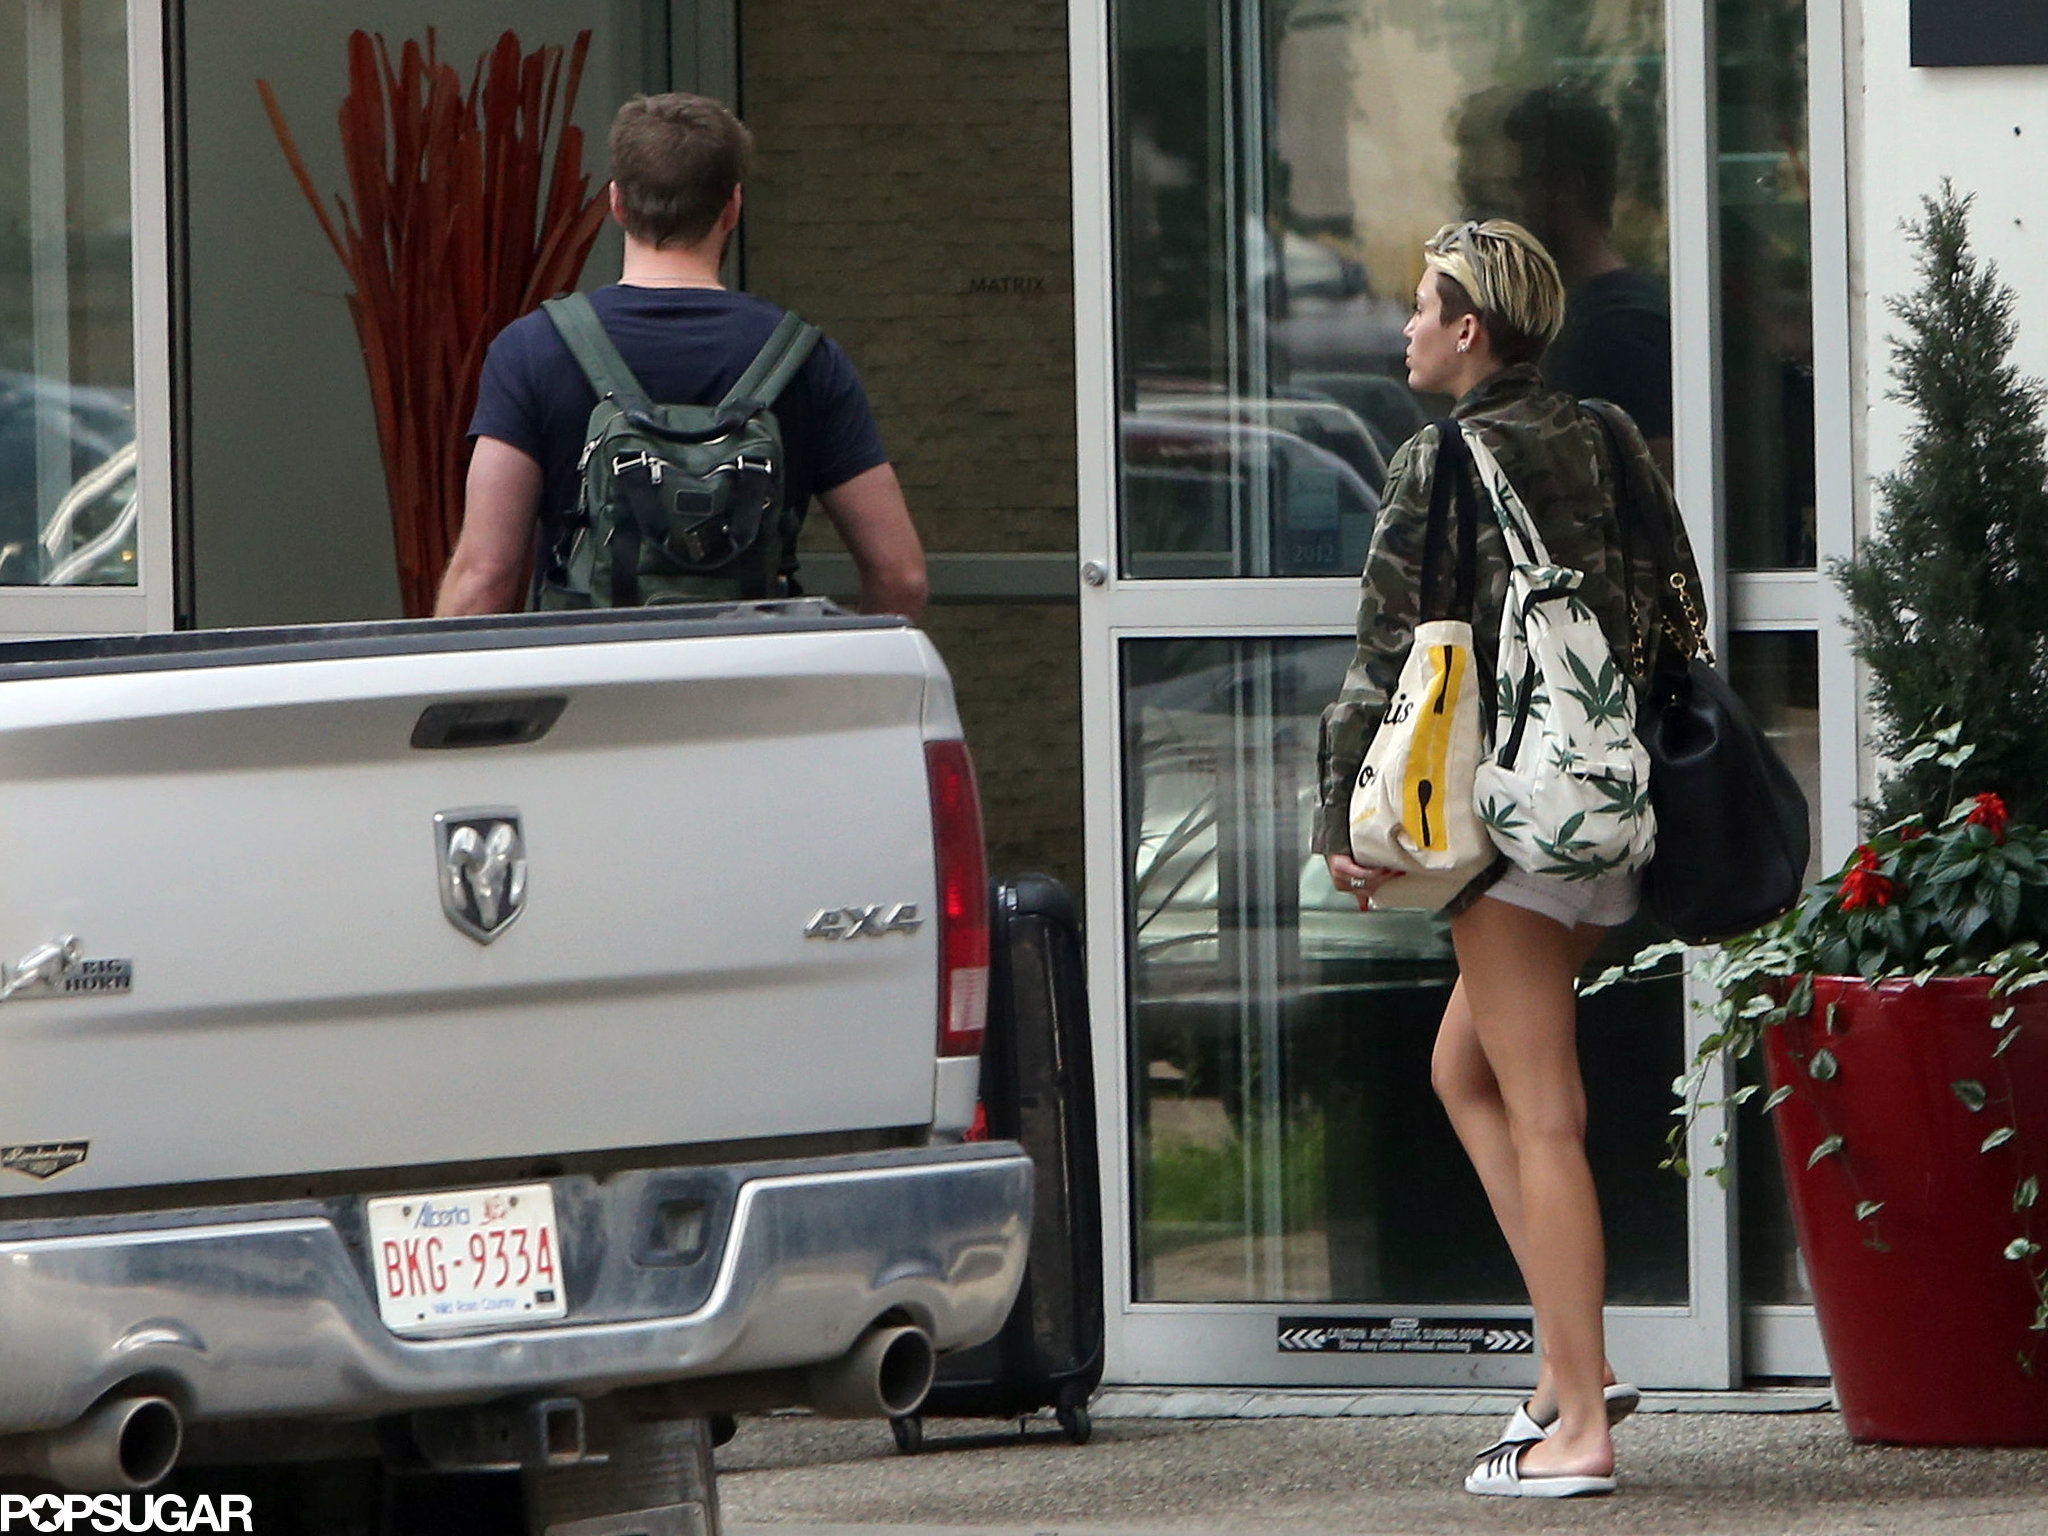 Miley Cyrus and Liam Hemsworth headed into a hotel in Alberta, Canada.